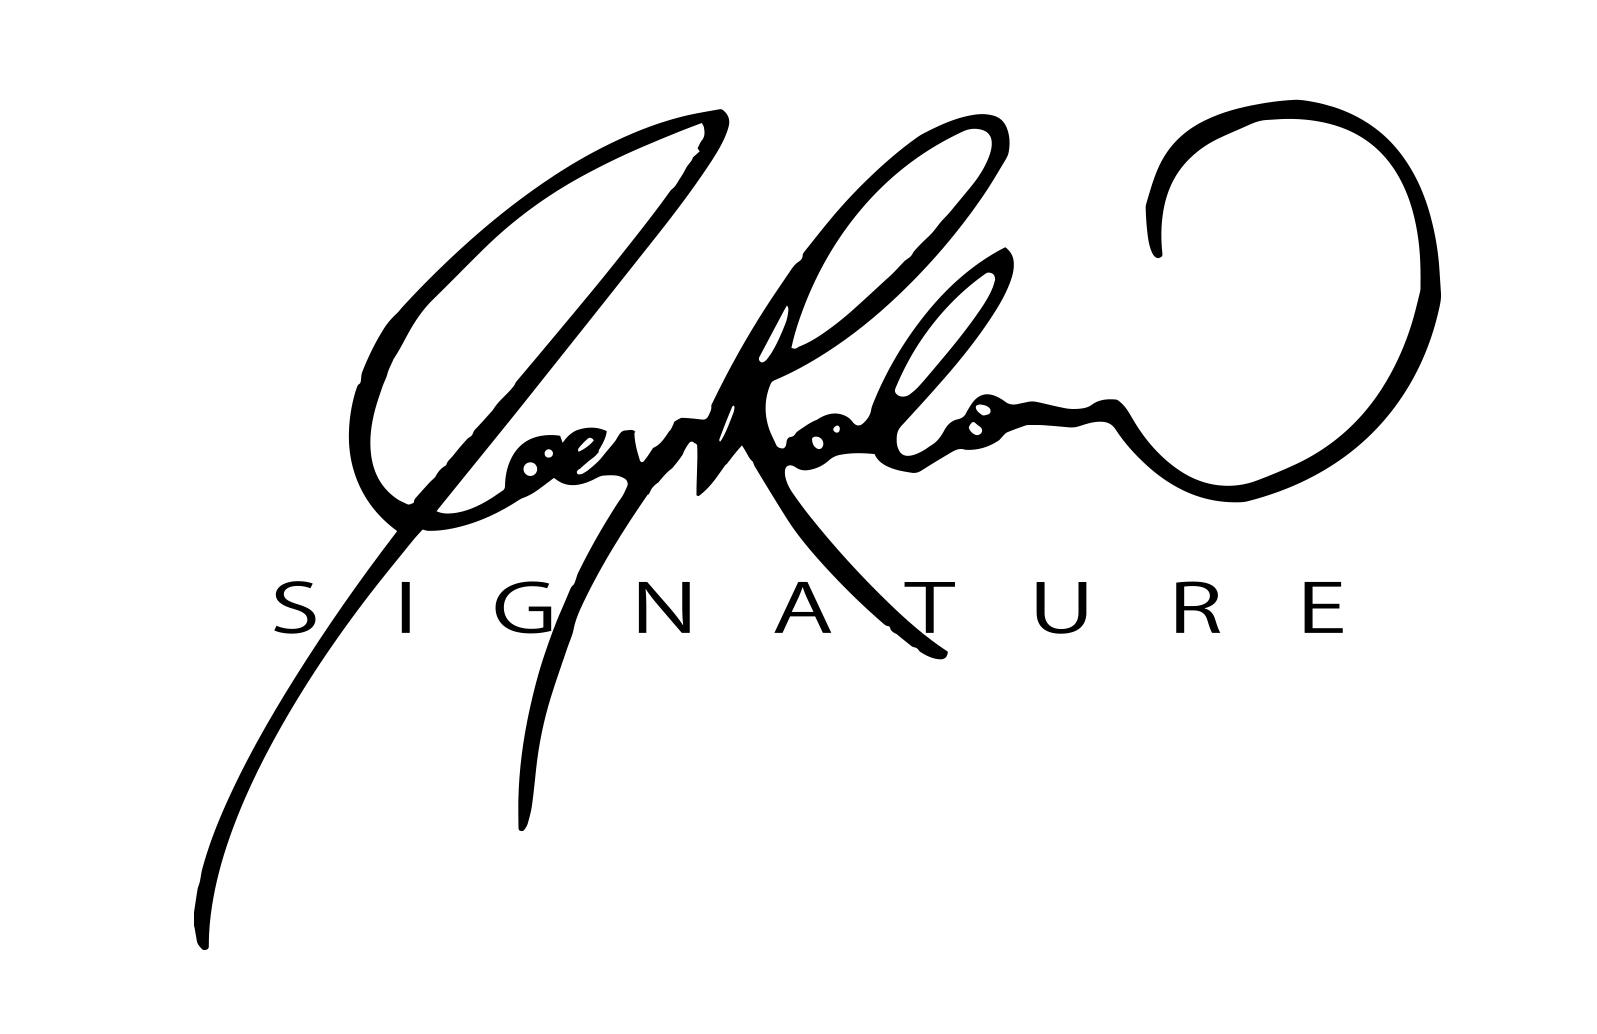 Joey Rolon Signature Spring 2019